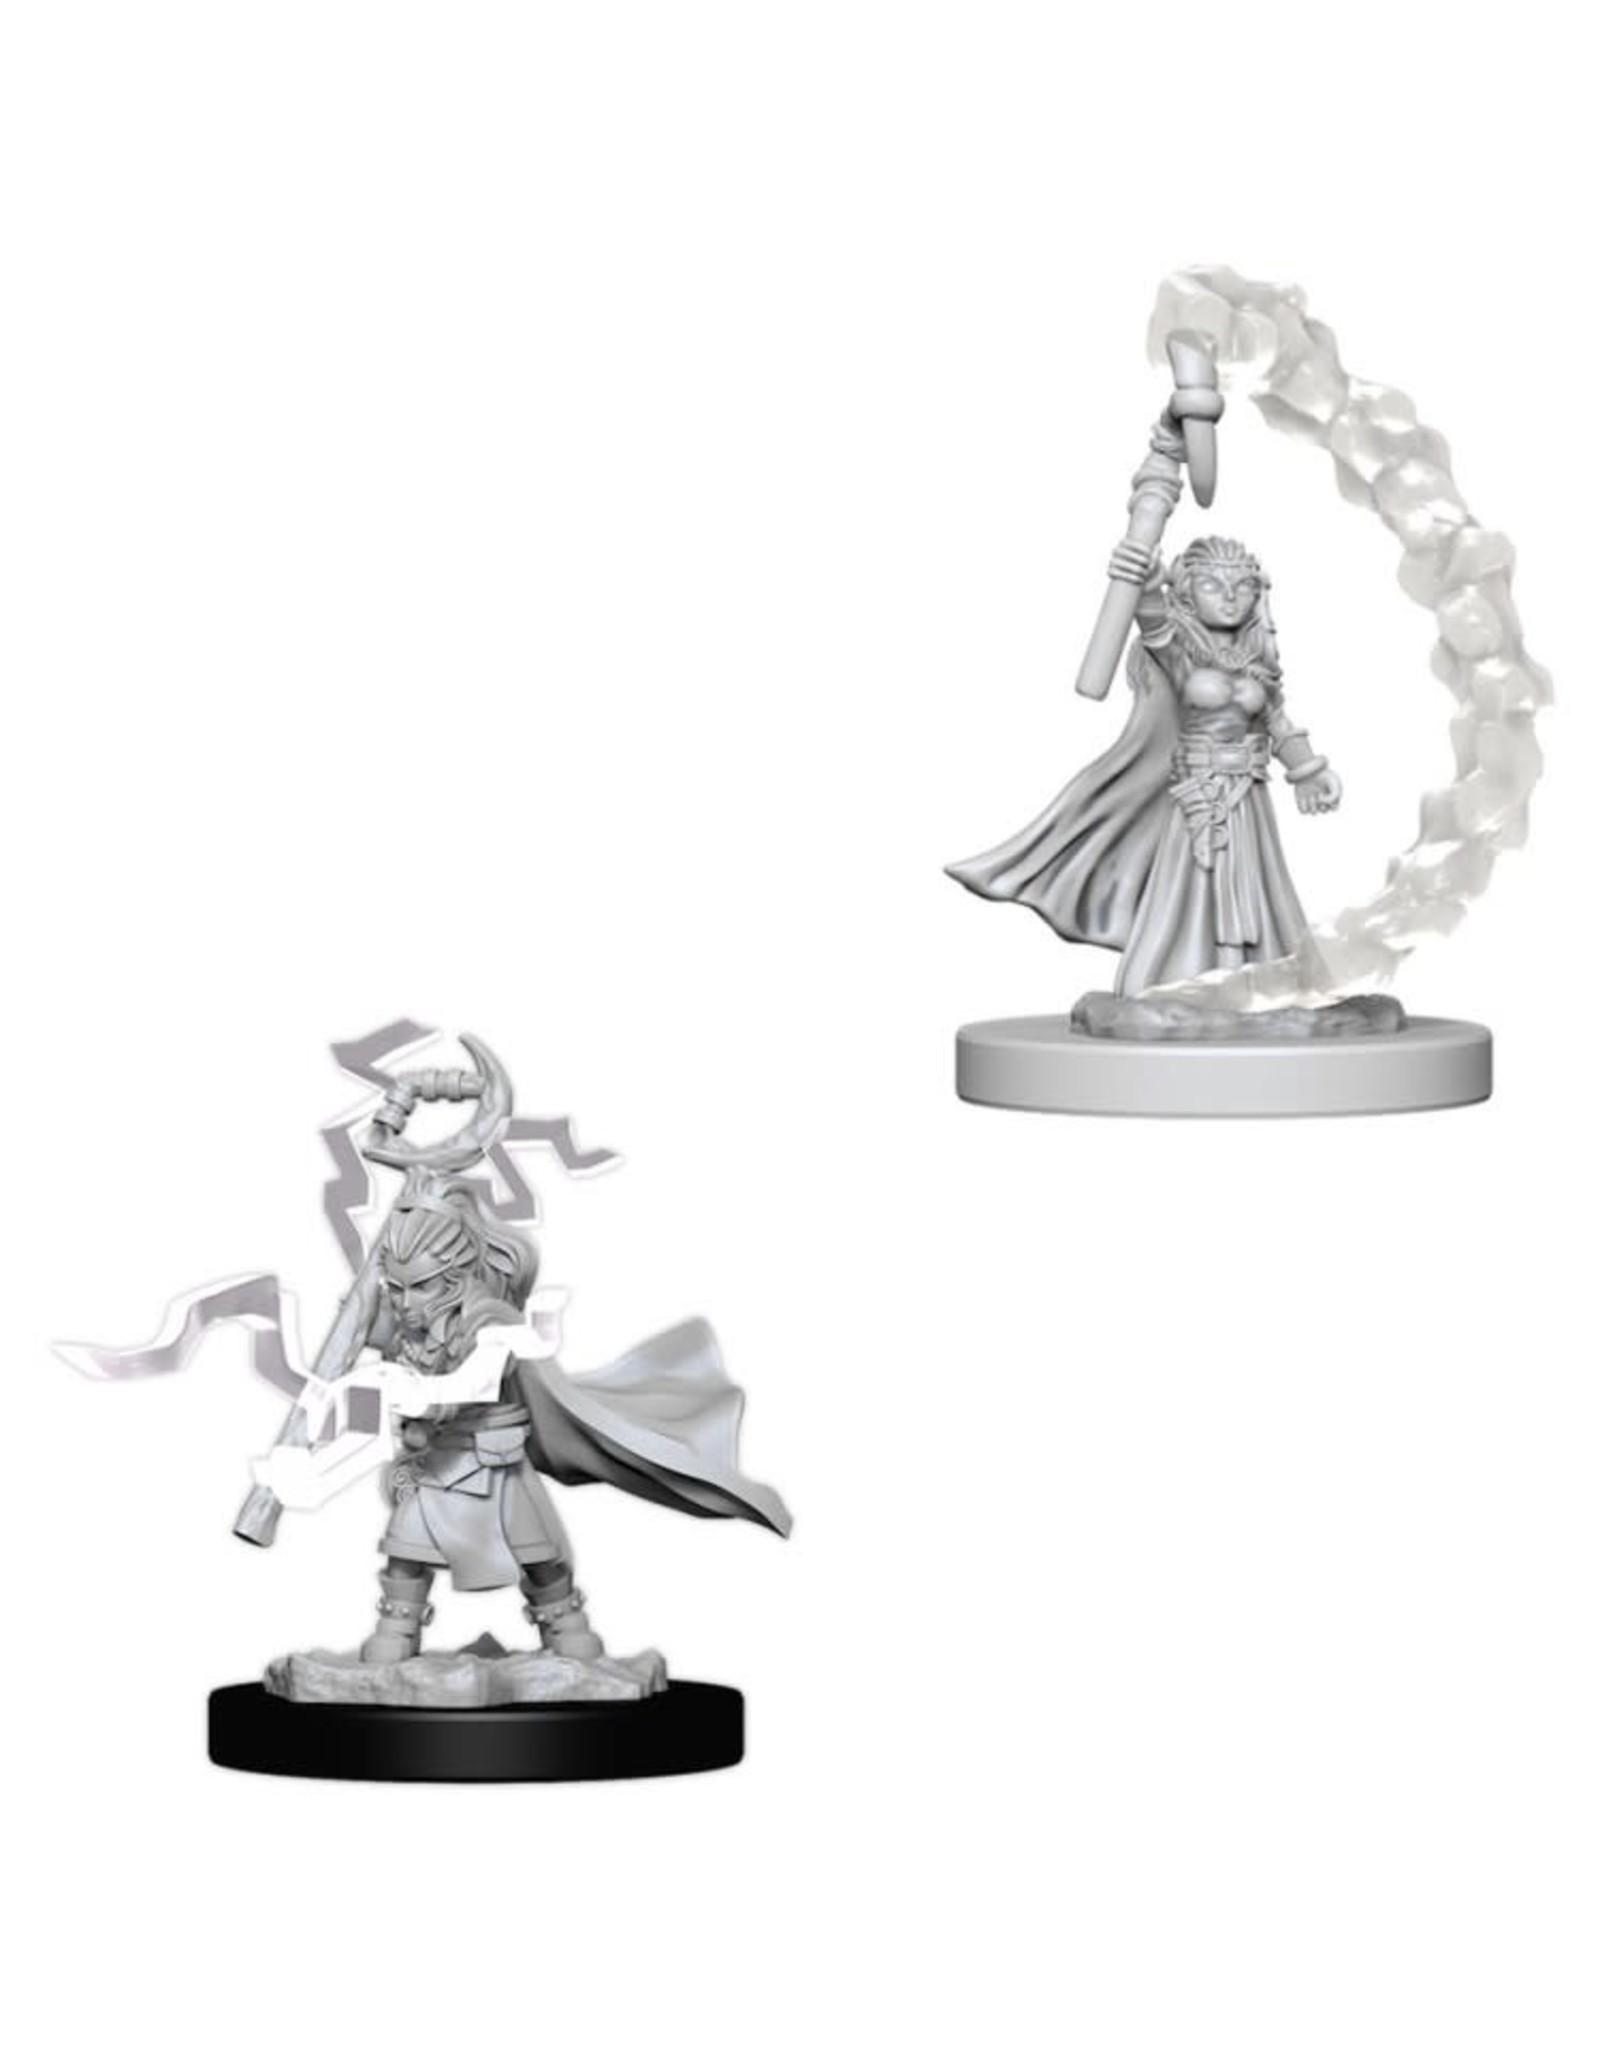 WizKids Pathfinder Minis (unpainted): Gnome Sorcerer (female) Wave 5, 73345